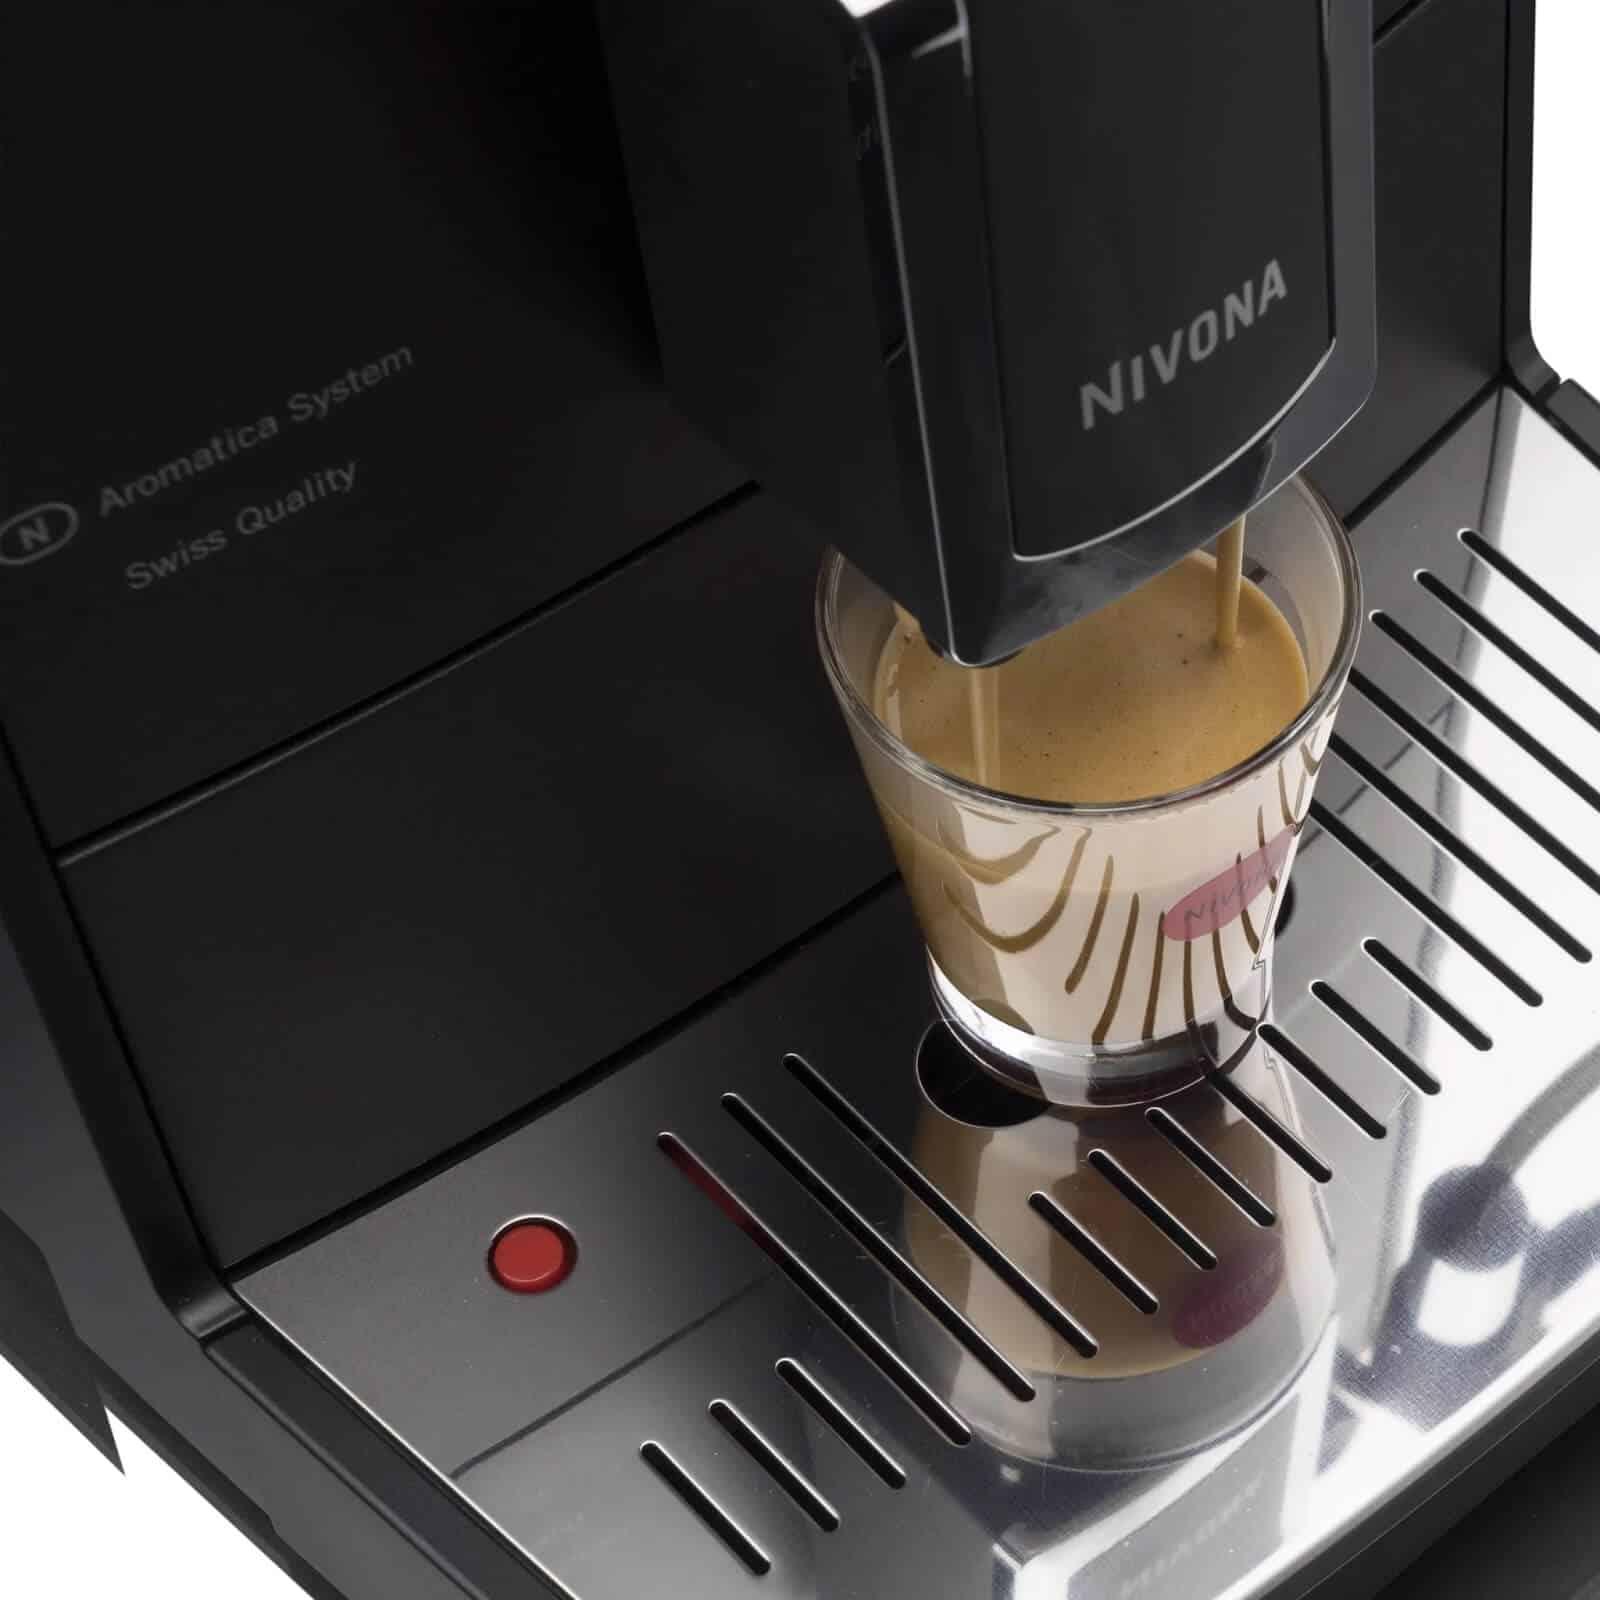 nivona coffee espresso